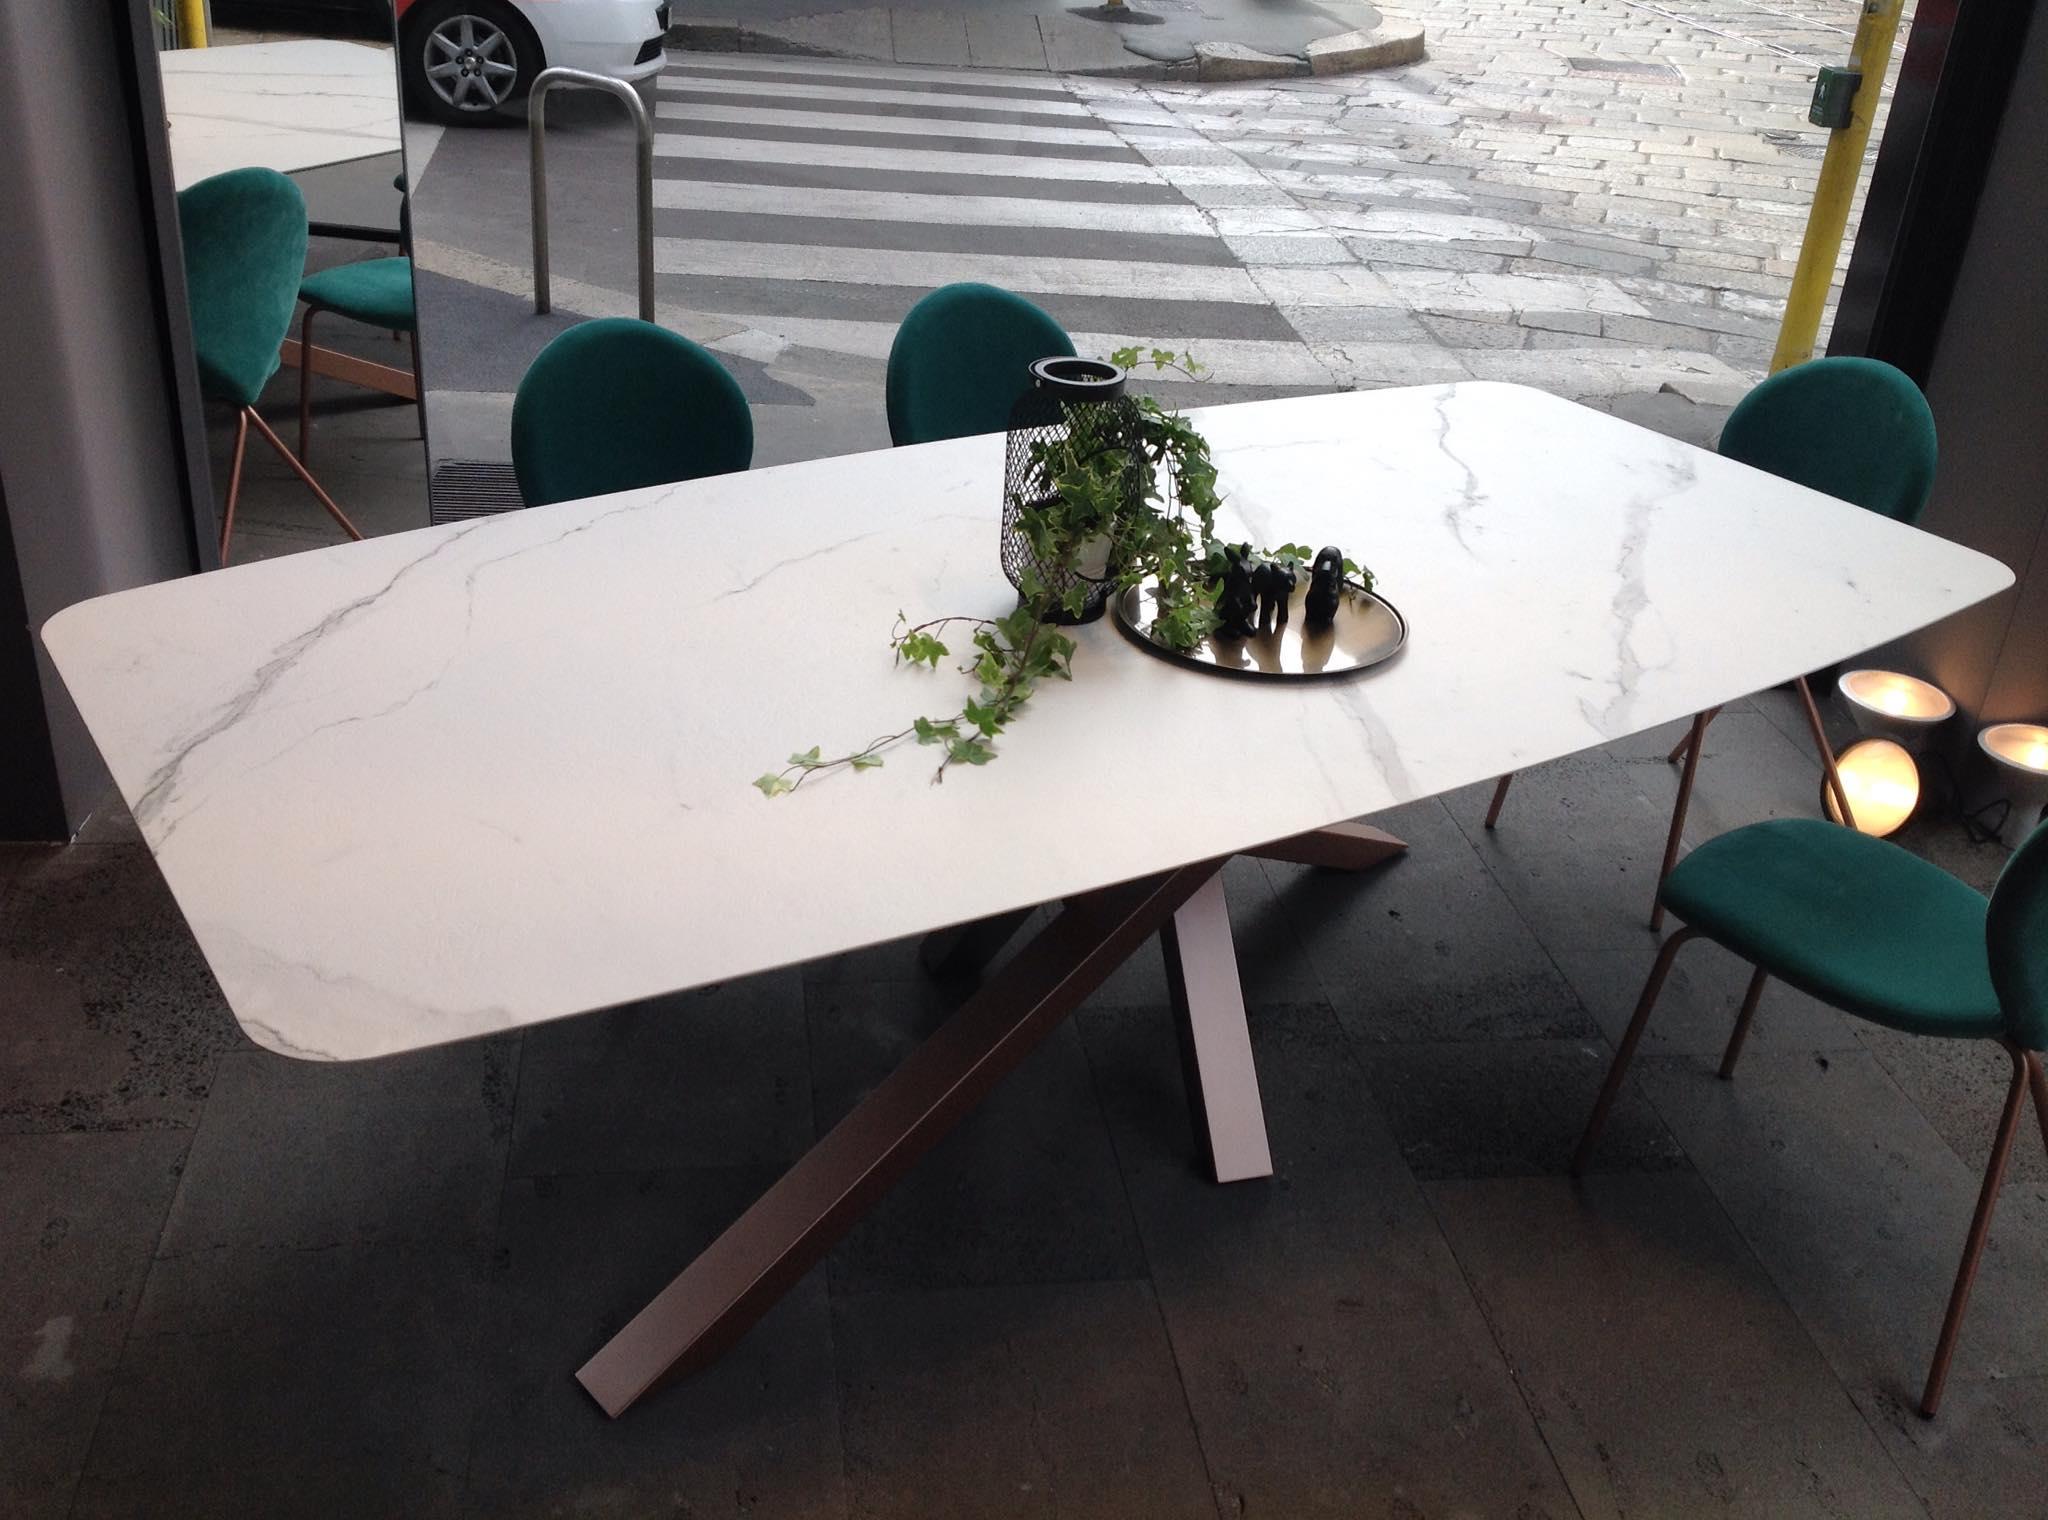 Emejing tavoli in ceramica gallery for Tavolo consolle riflessi